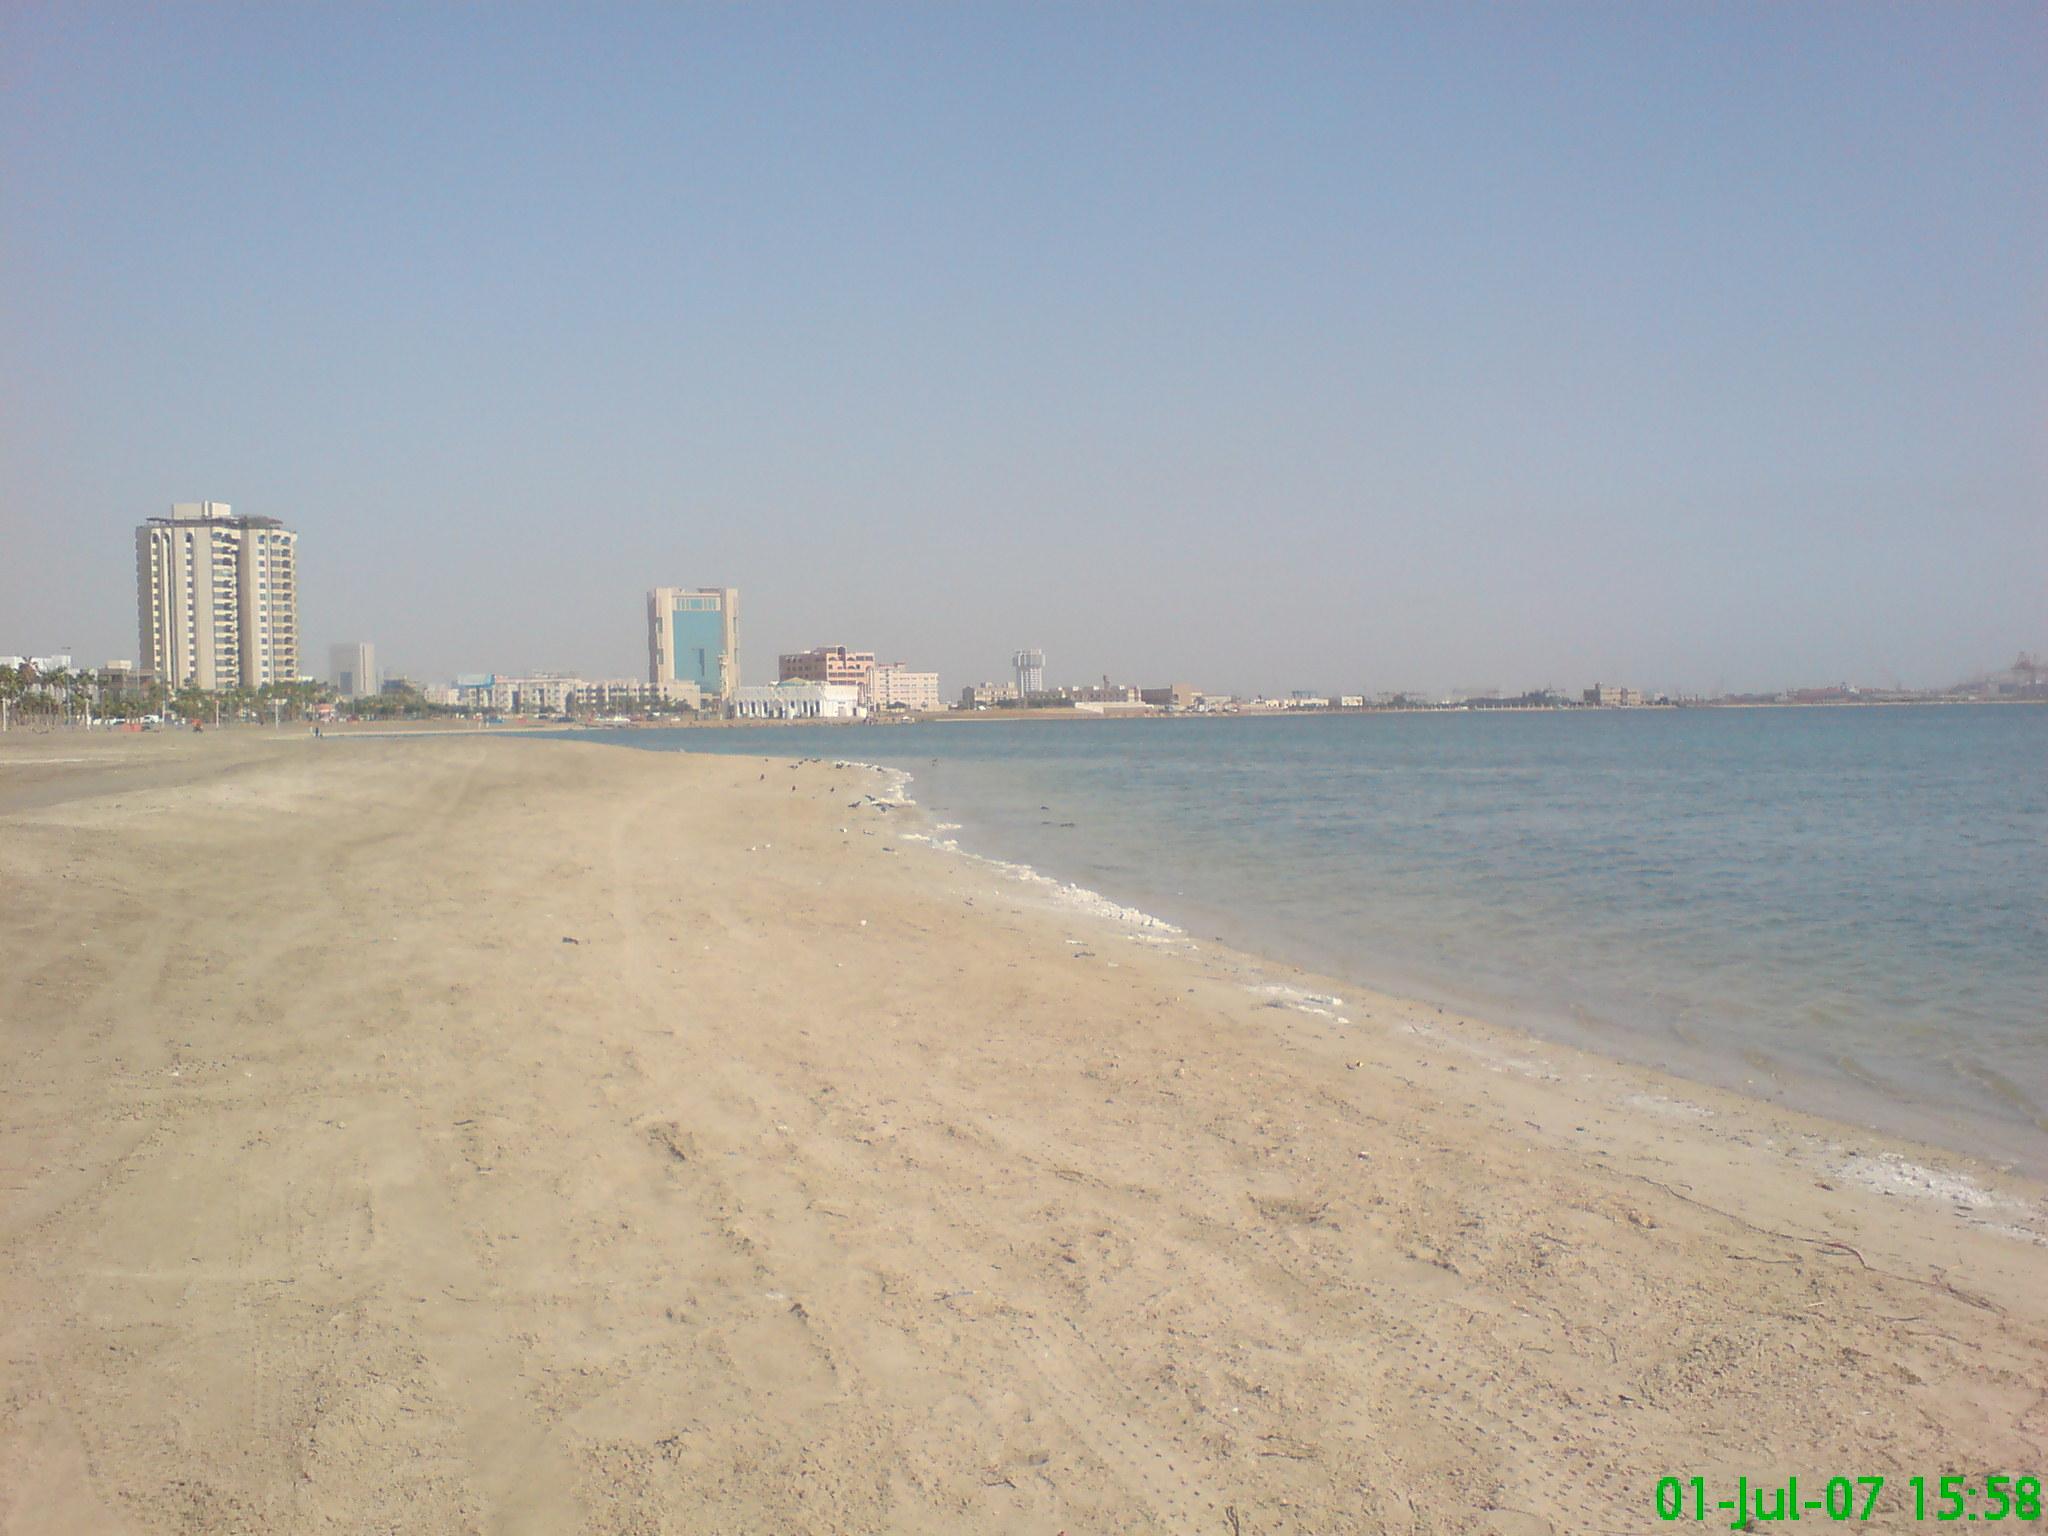 File:Jeddah Beach.jpg - Wikimedia Commons Beach